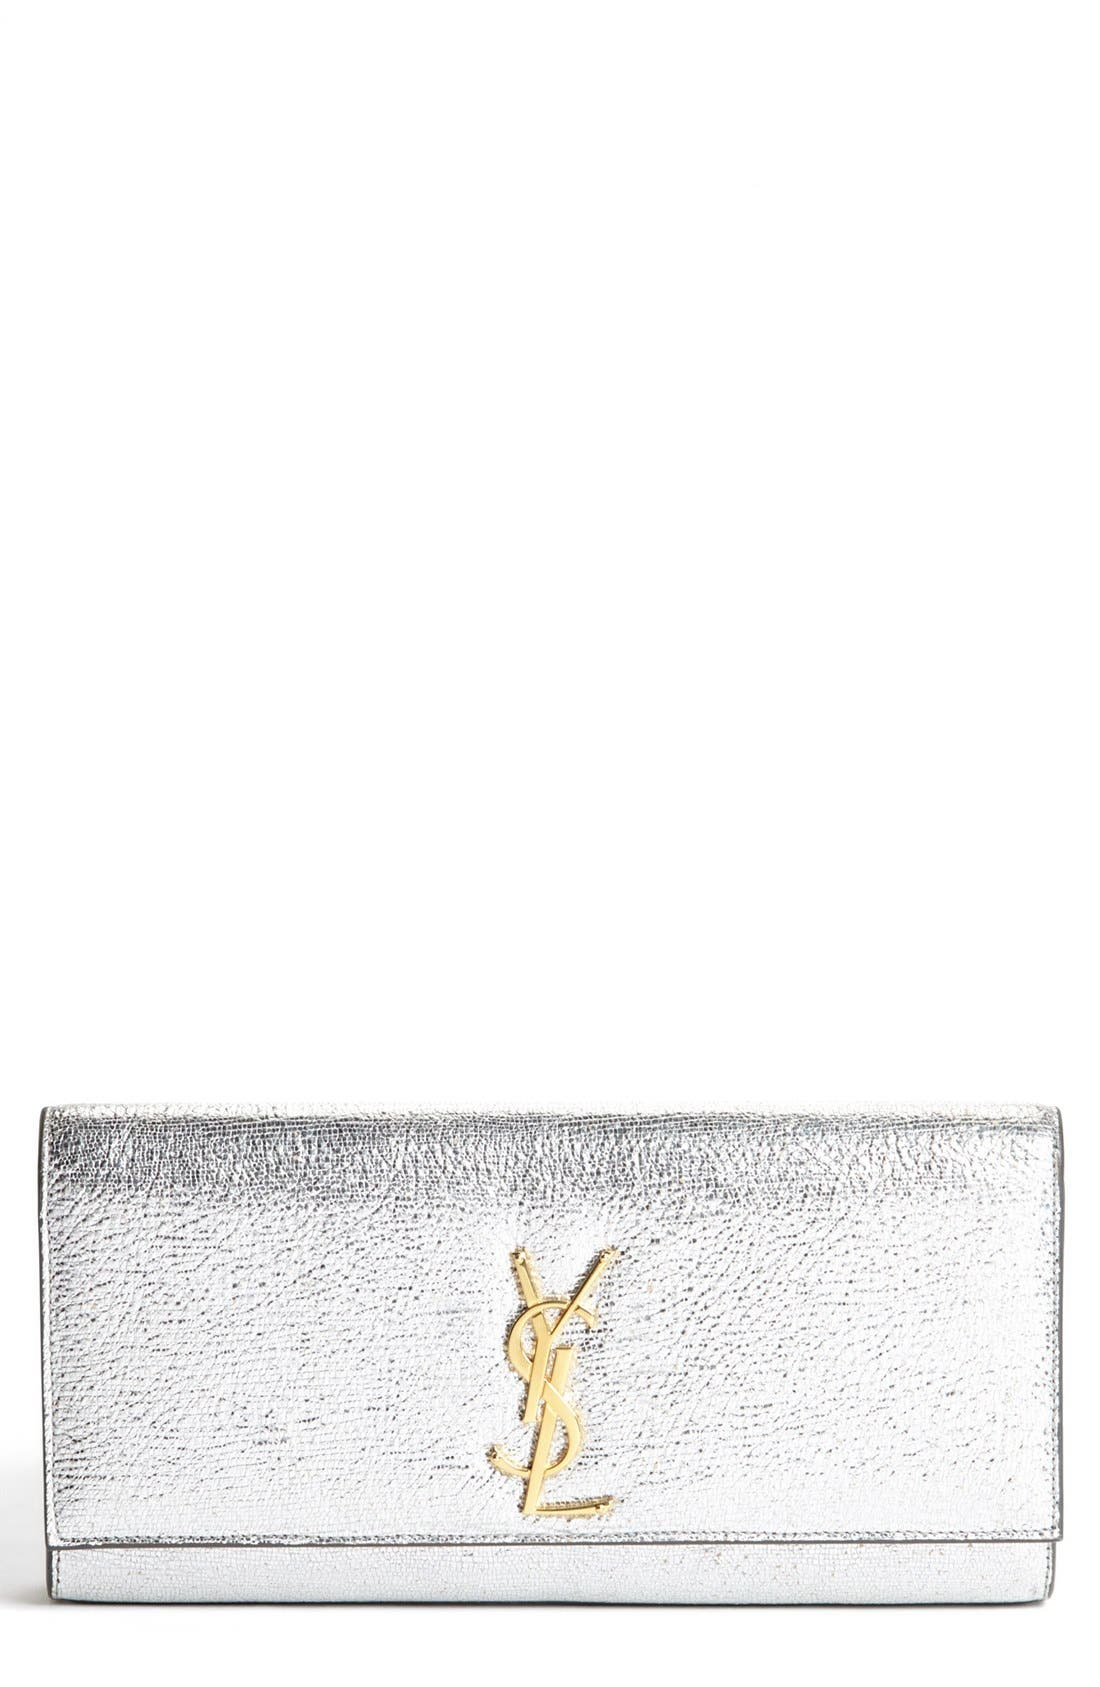 Alternate Image 1 Selected - Saint Laurent 'Cassandre - Metallique' Clutch